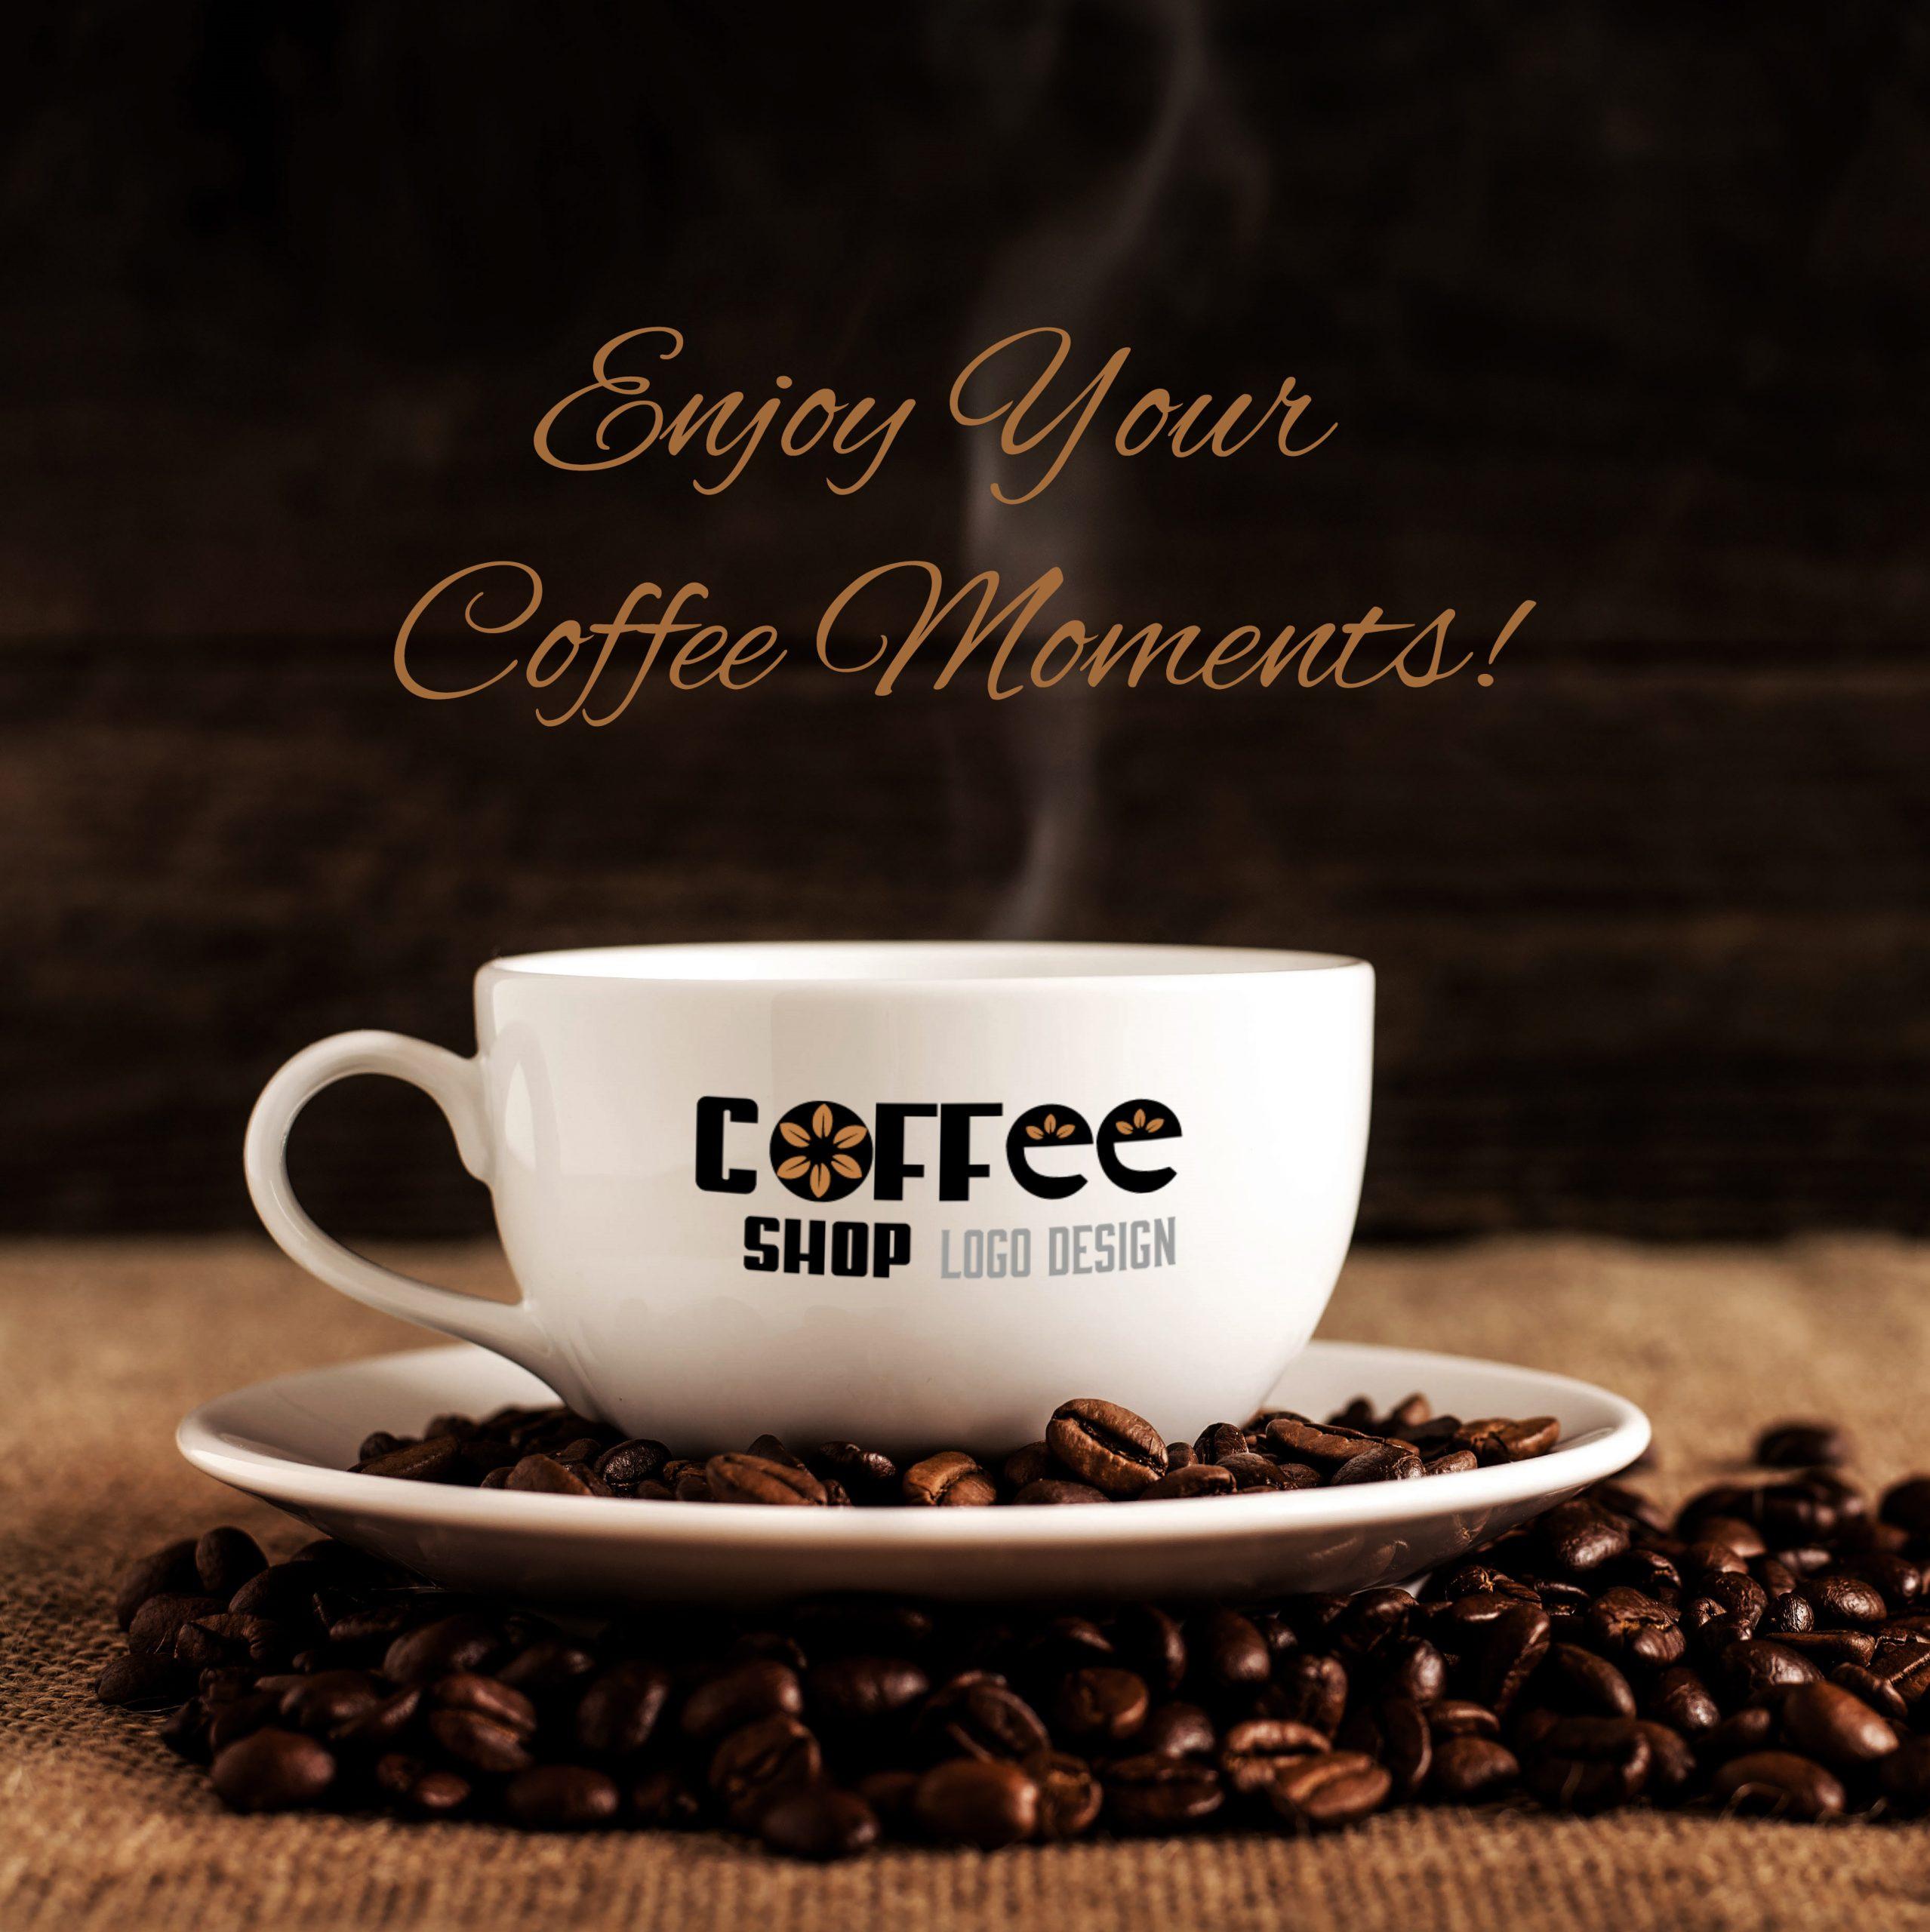 coffe-shop-logo-design-branding-3-instagram